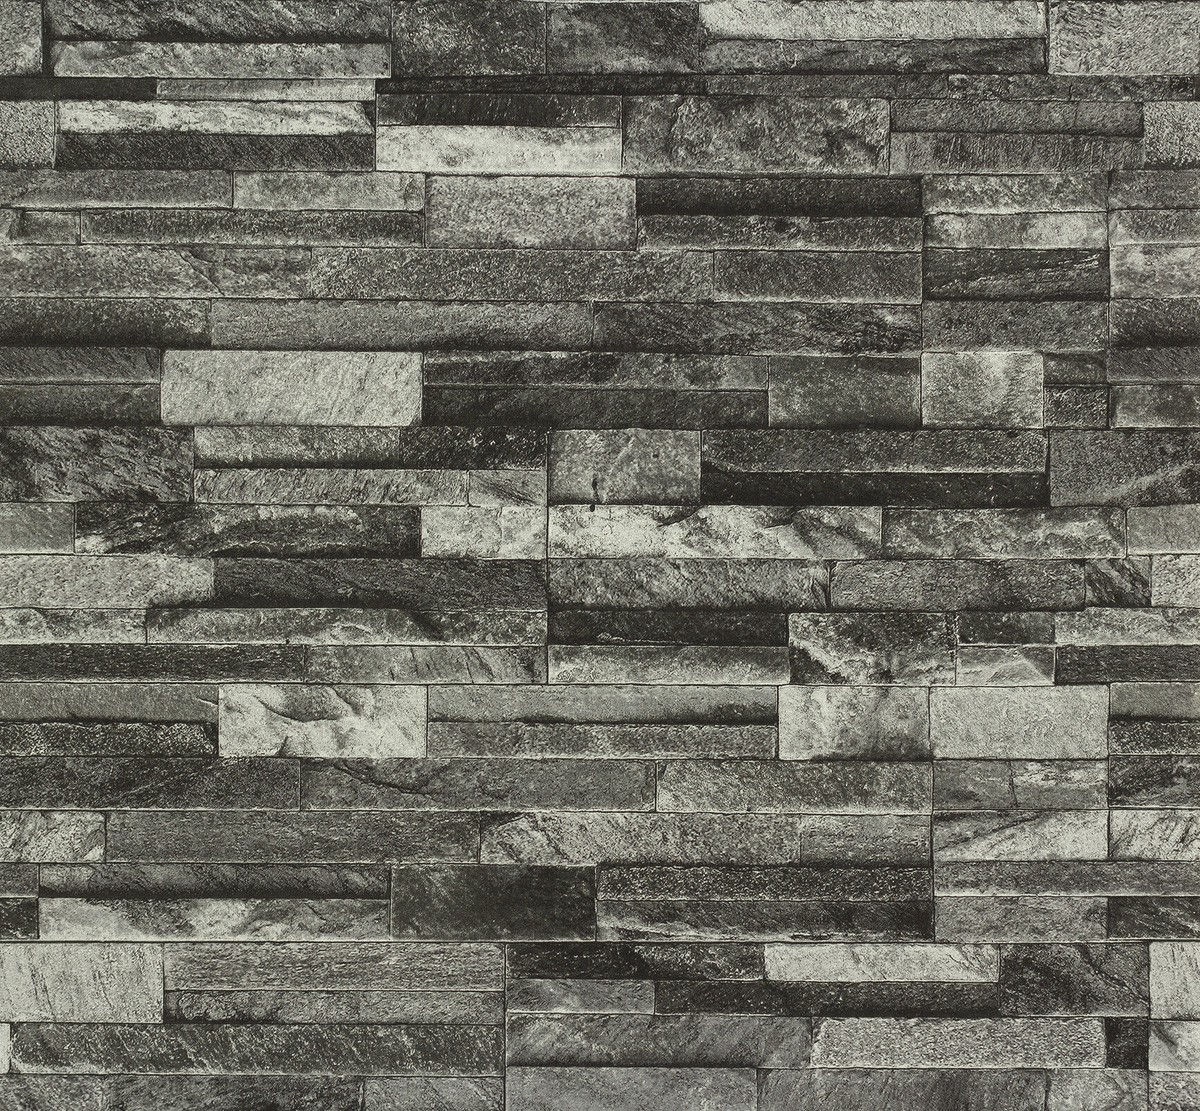 vliestapete stein grau p s origin 42106 20. Black Bedroom Furniture Sets. Home Design Ideas